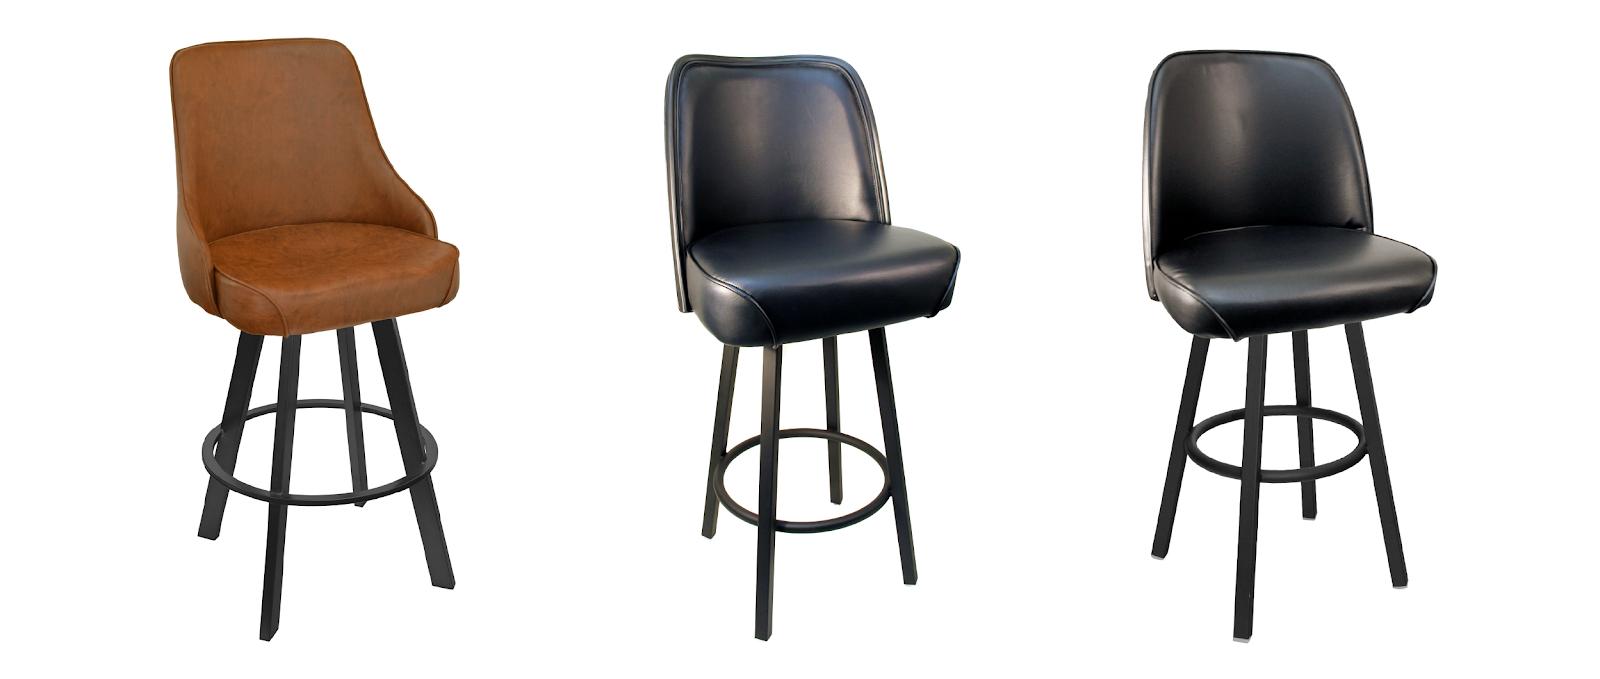 Awe Inspiring East Coast Chair Barstool Blog Tableschairsbarstools Com Theyellowbook Wood Chair Design Ideas Theyellowbookinfo